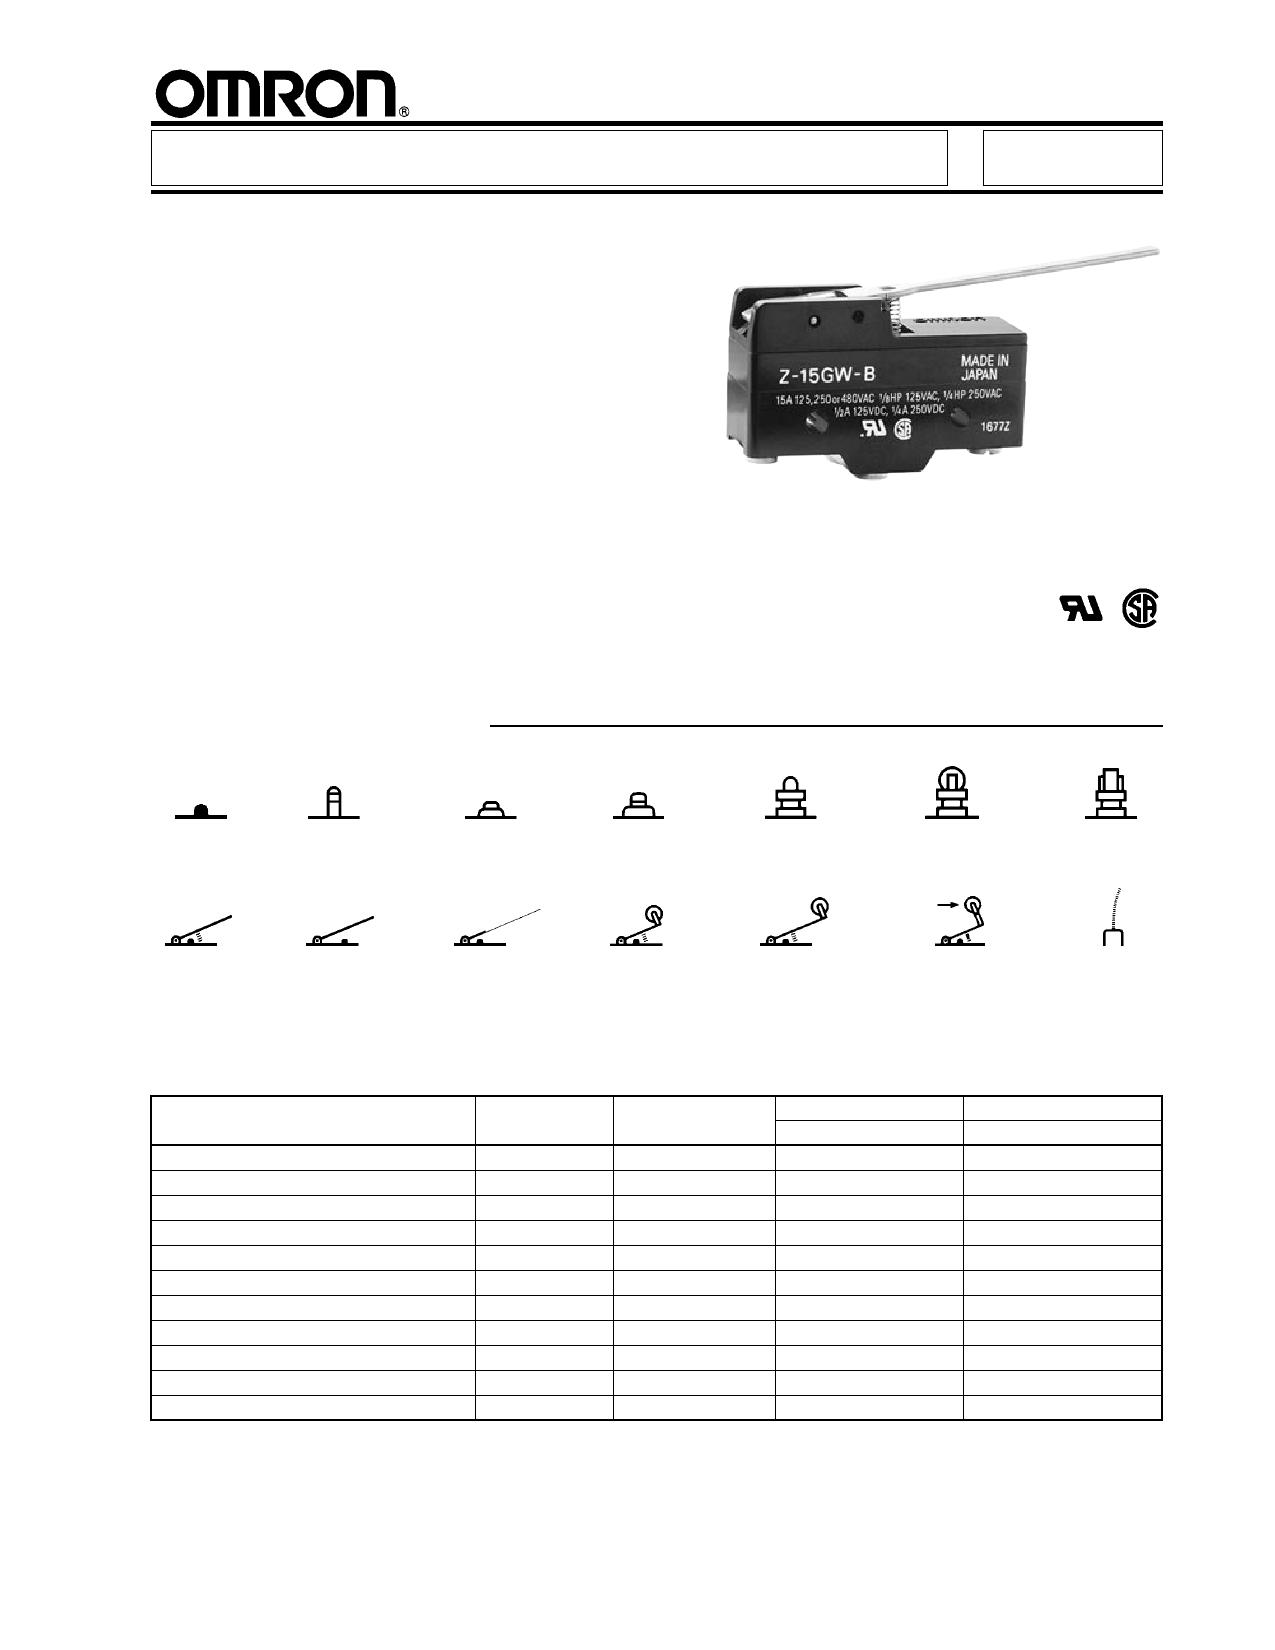 Z-15GQ22-B datasheet